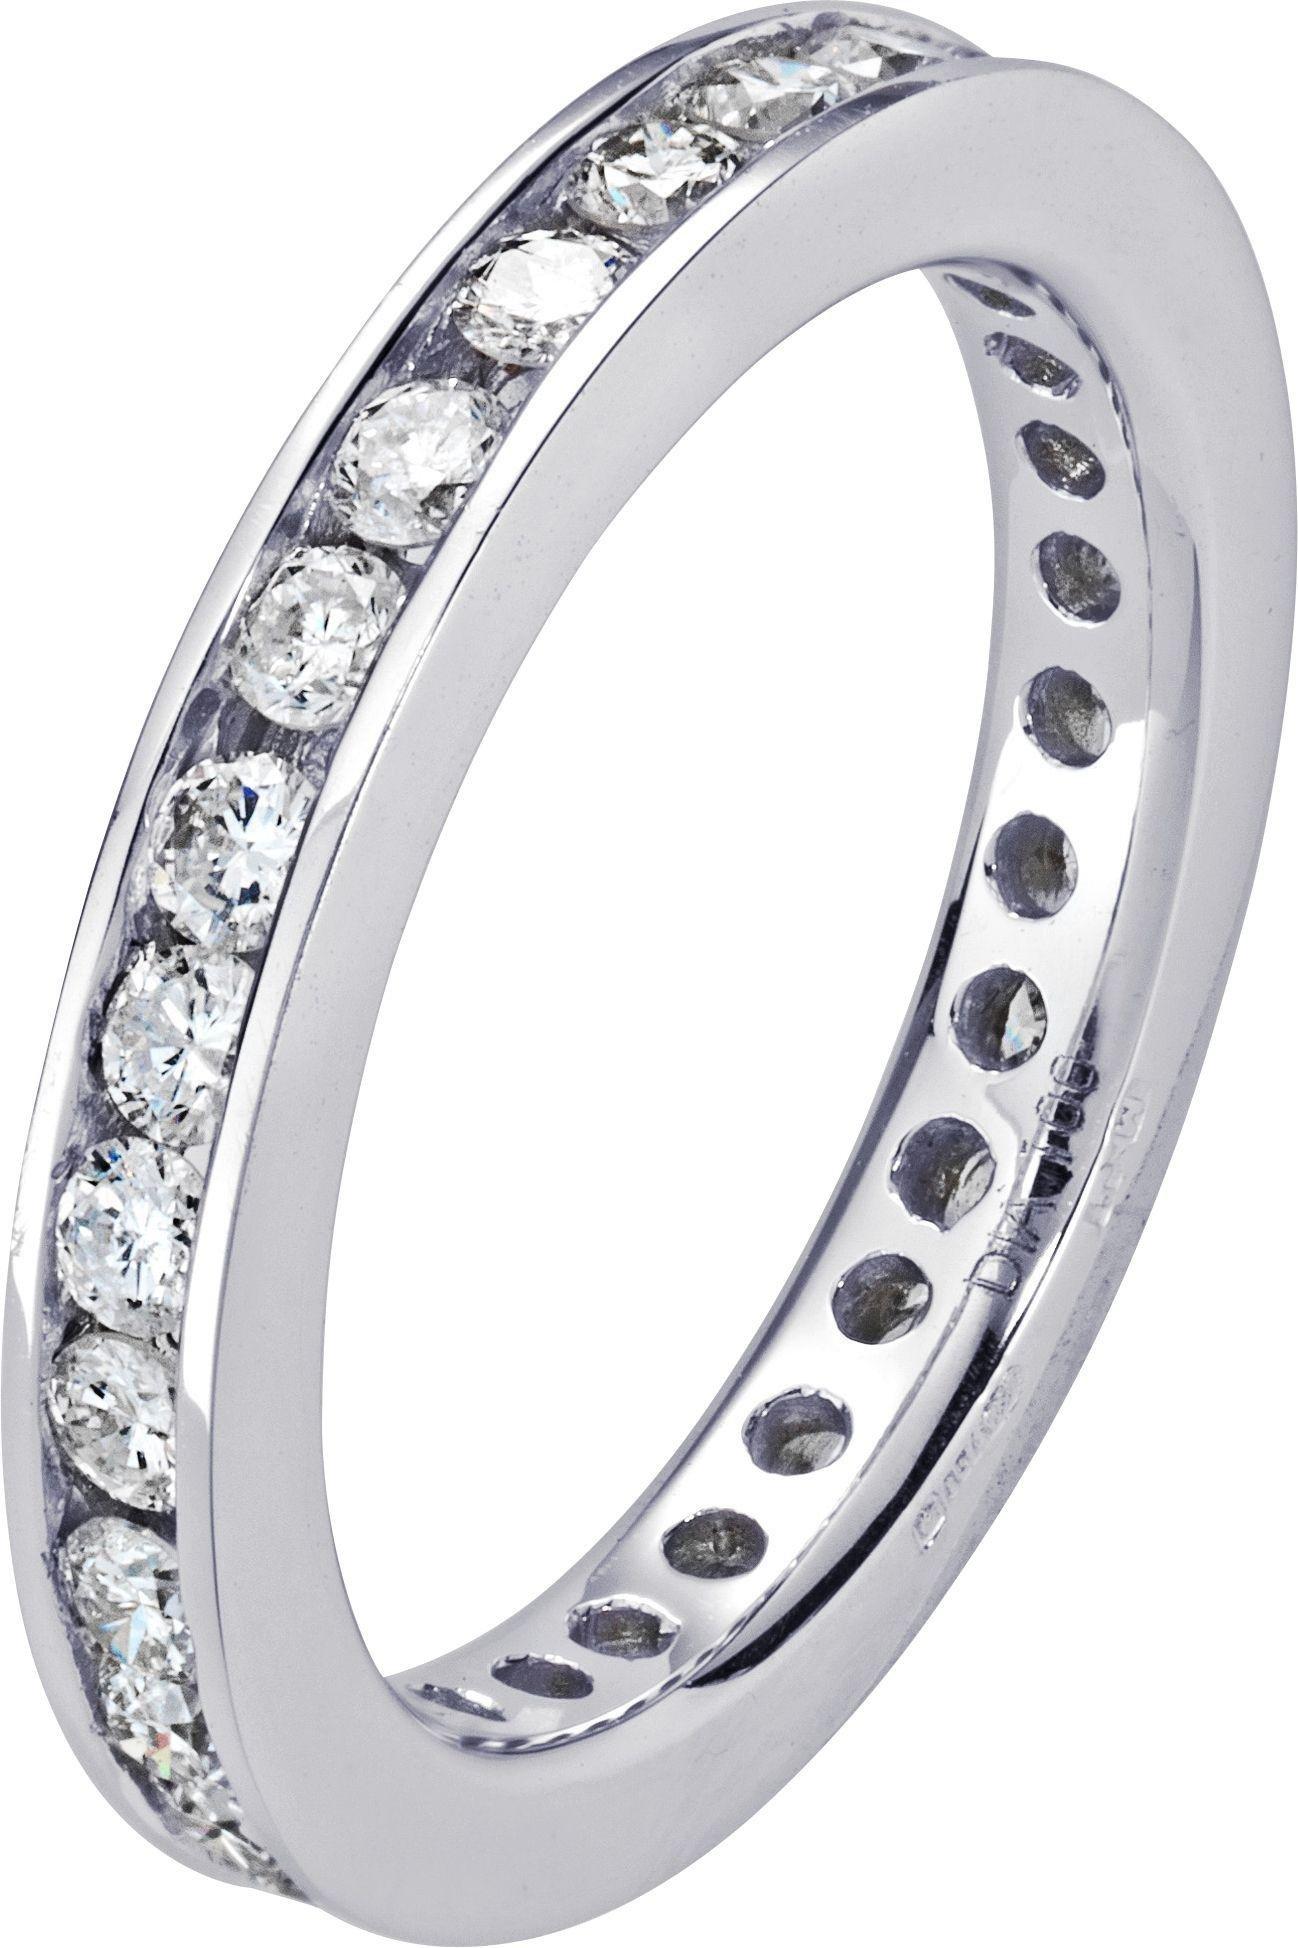 Buy Everlasting Love 18ct White Gold 1 00ct Diamond Ring J at